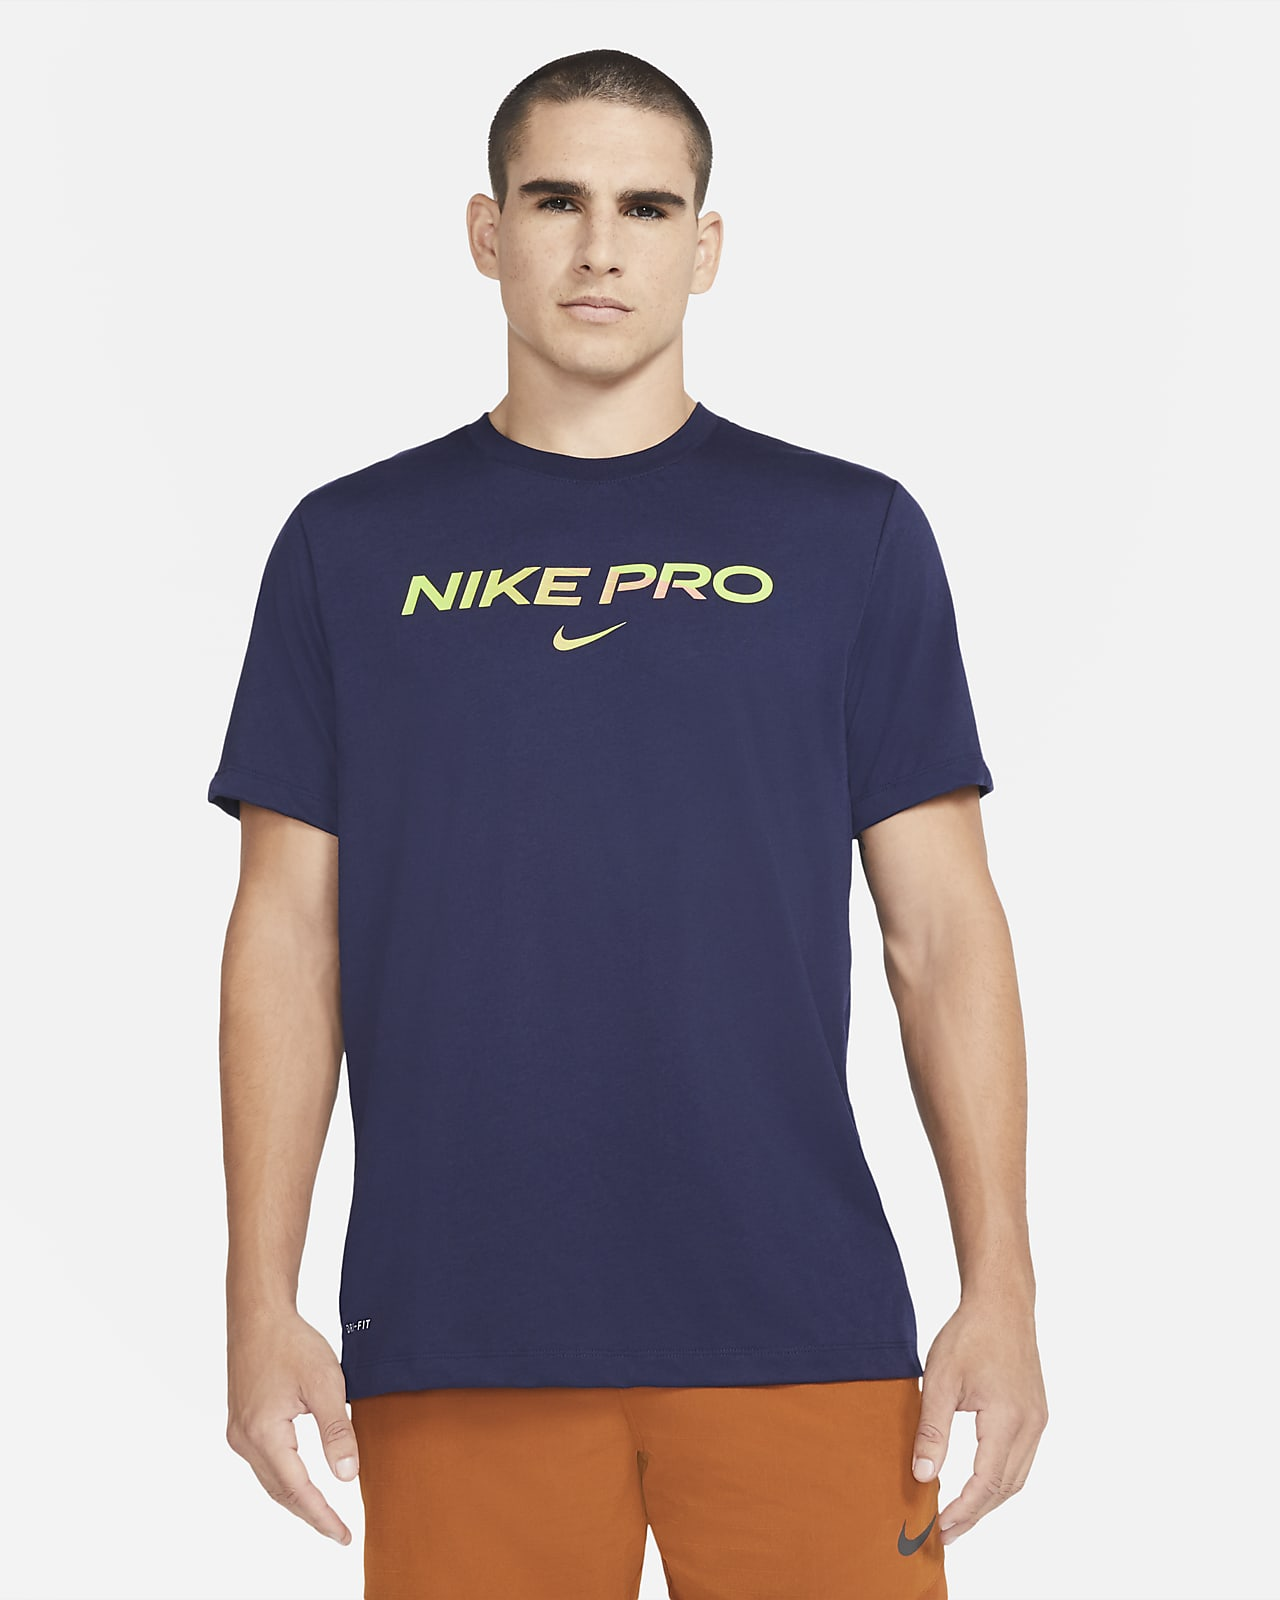 Nike Pro Camiseta - Hombre